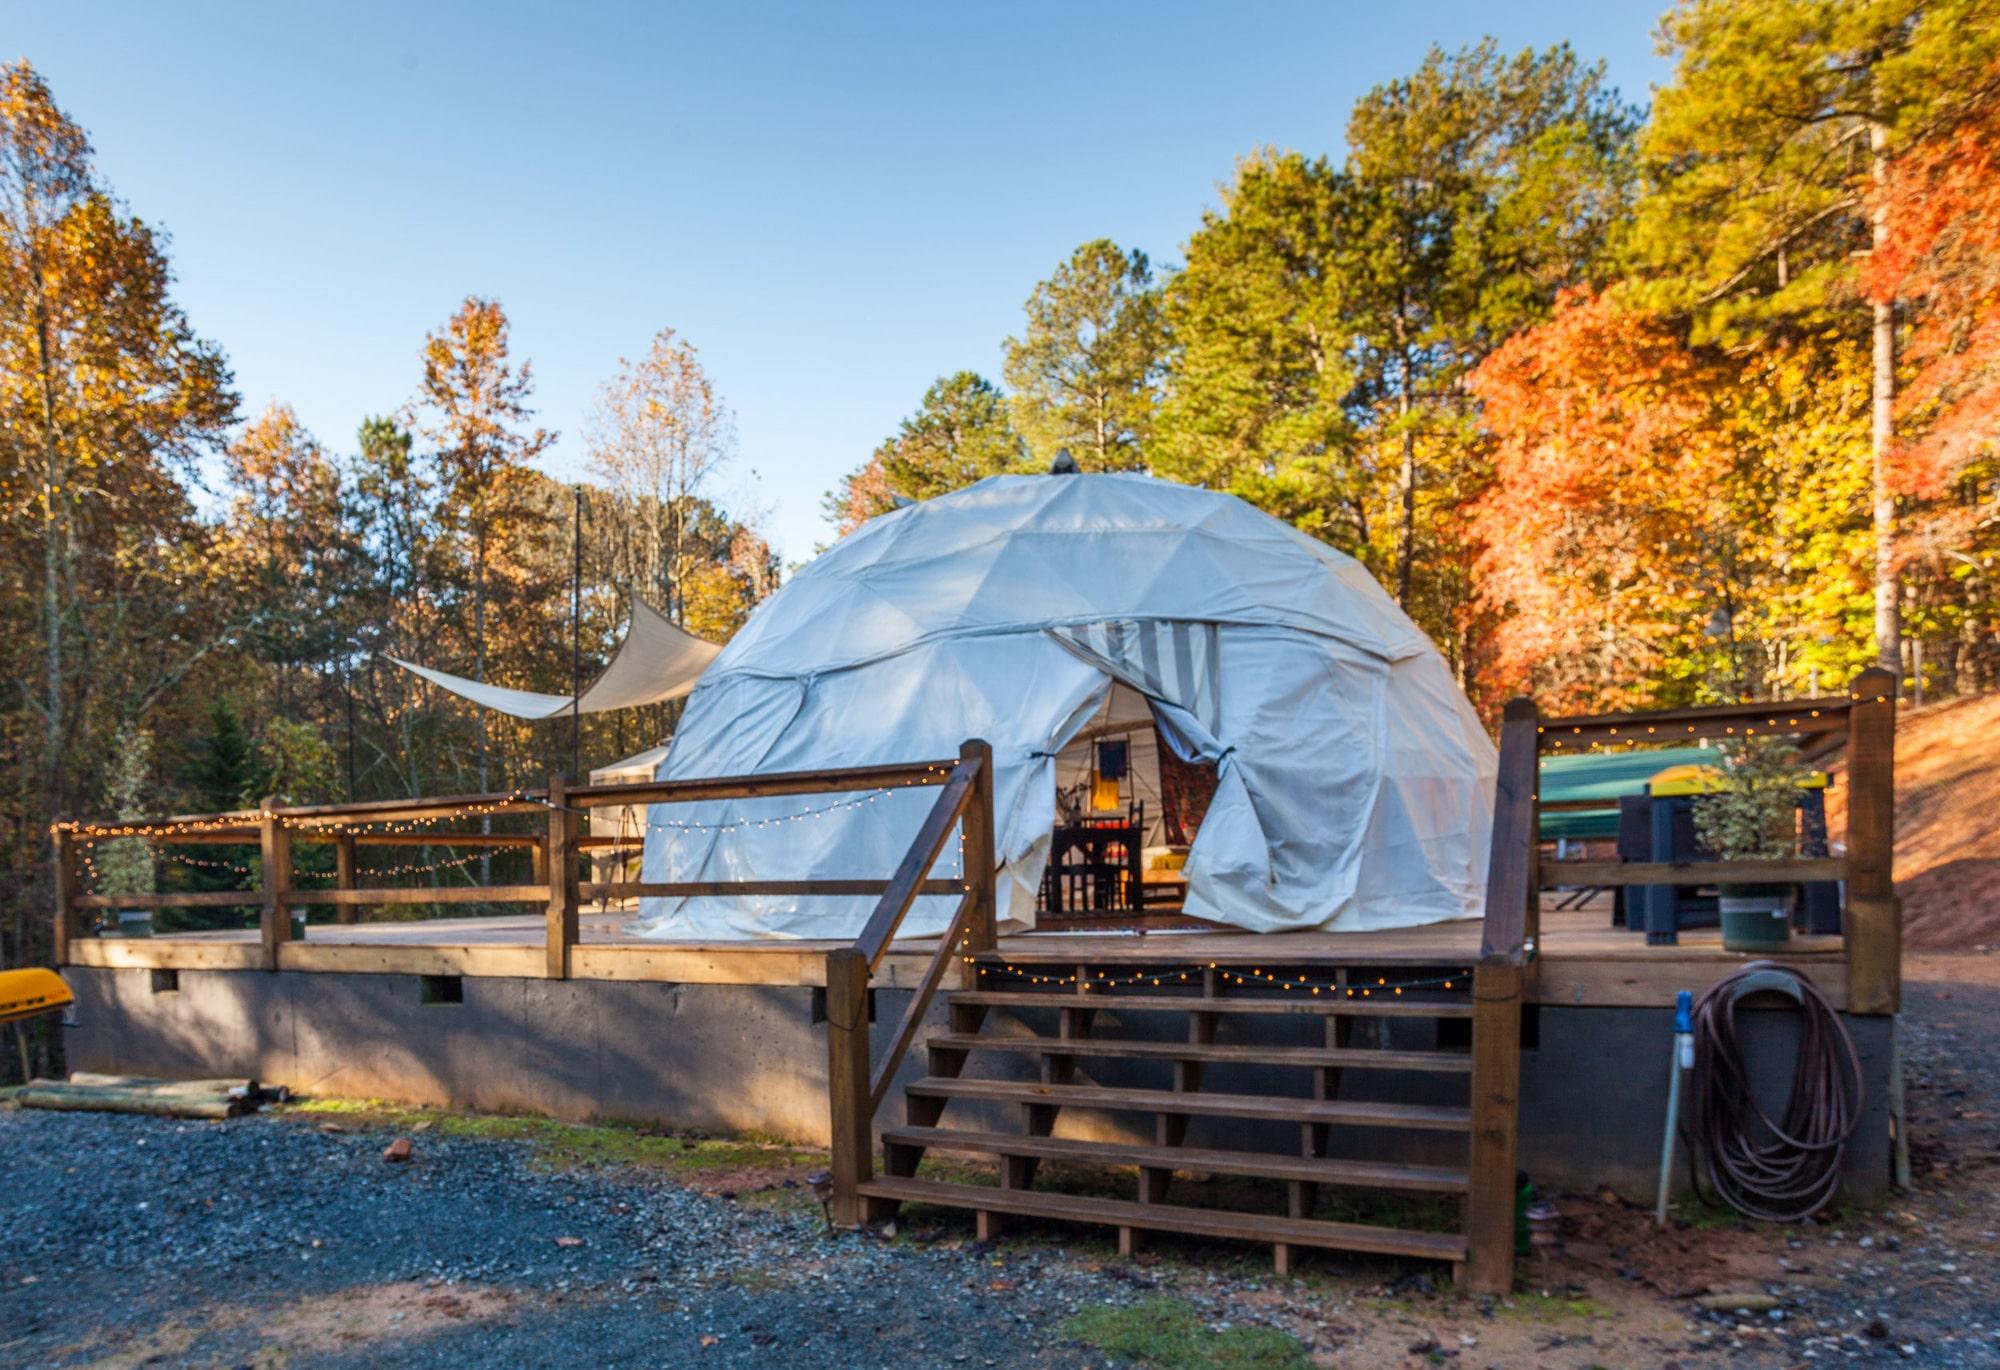 Sleep in a geodesic dome tent at Elatse'Yi in Ellijay, Georgia